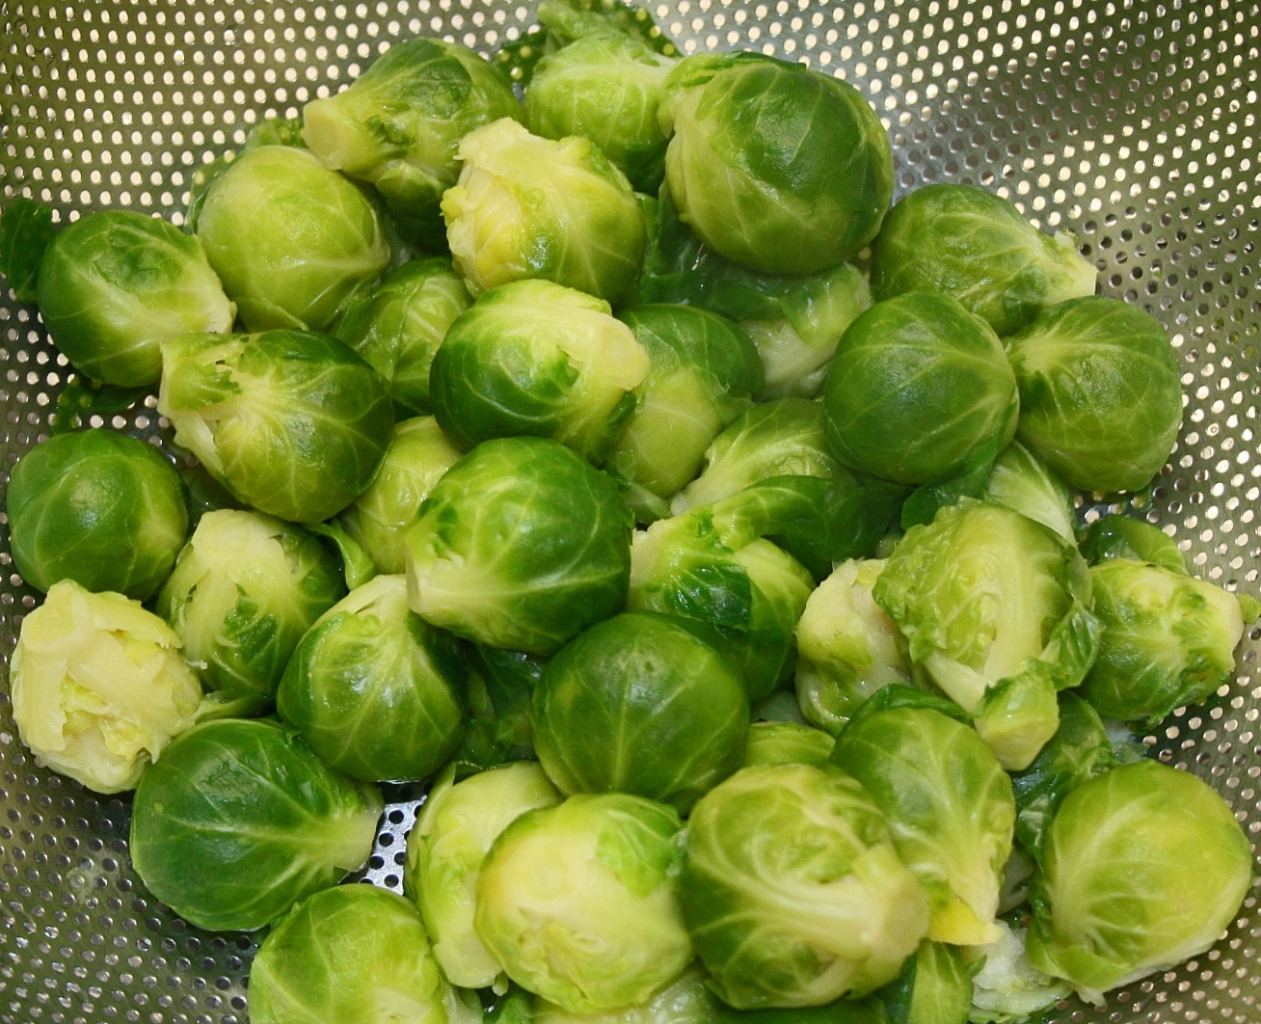 Brussels Sprouts | Image Credit: Lebensmittelfotos pixabay.com